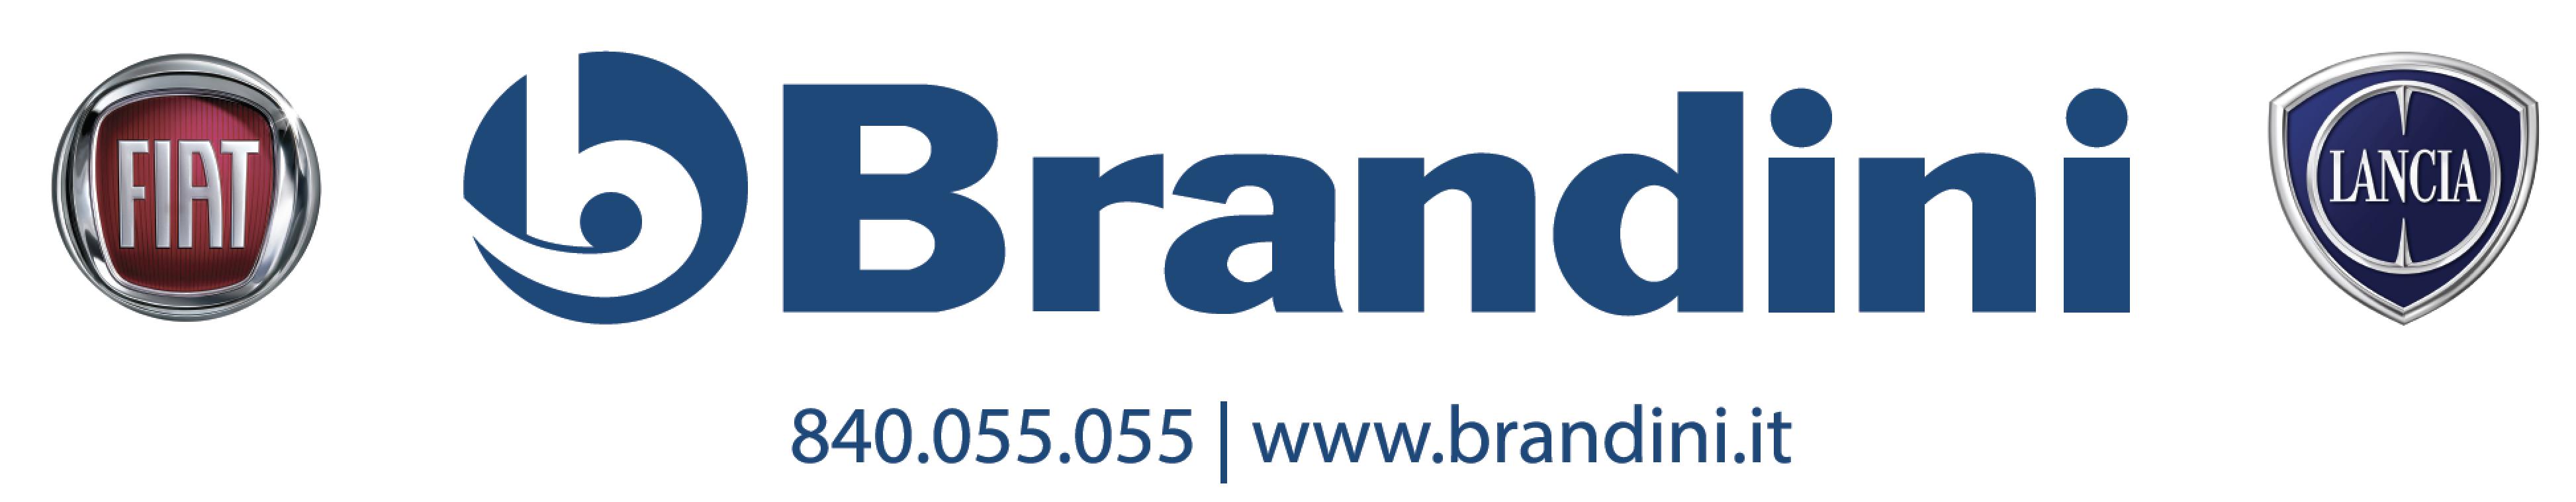 Brandini-Fiat-Lancia